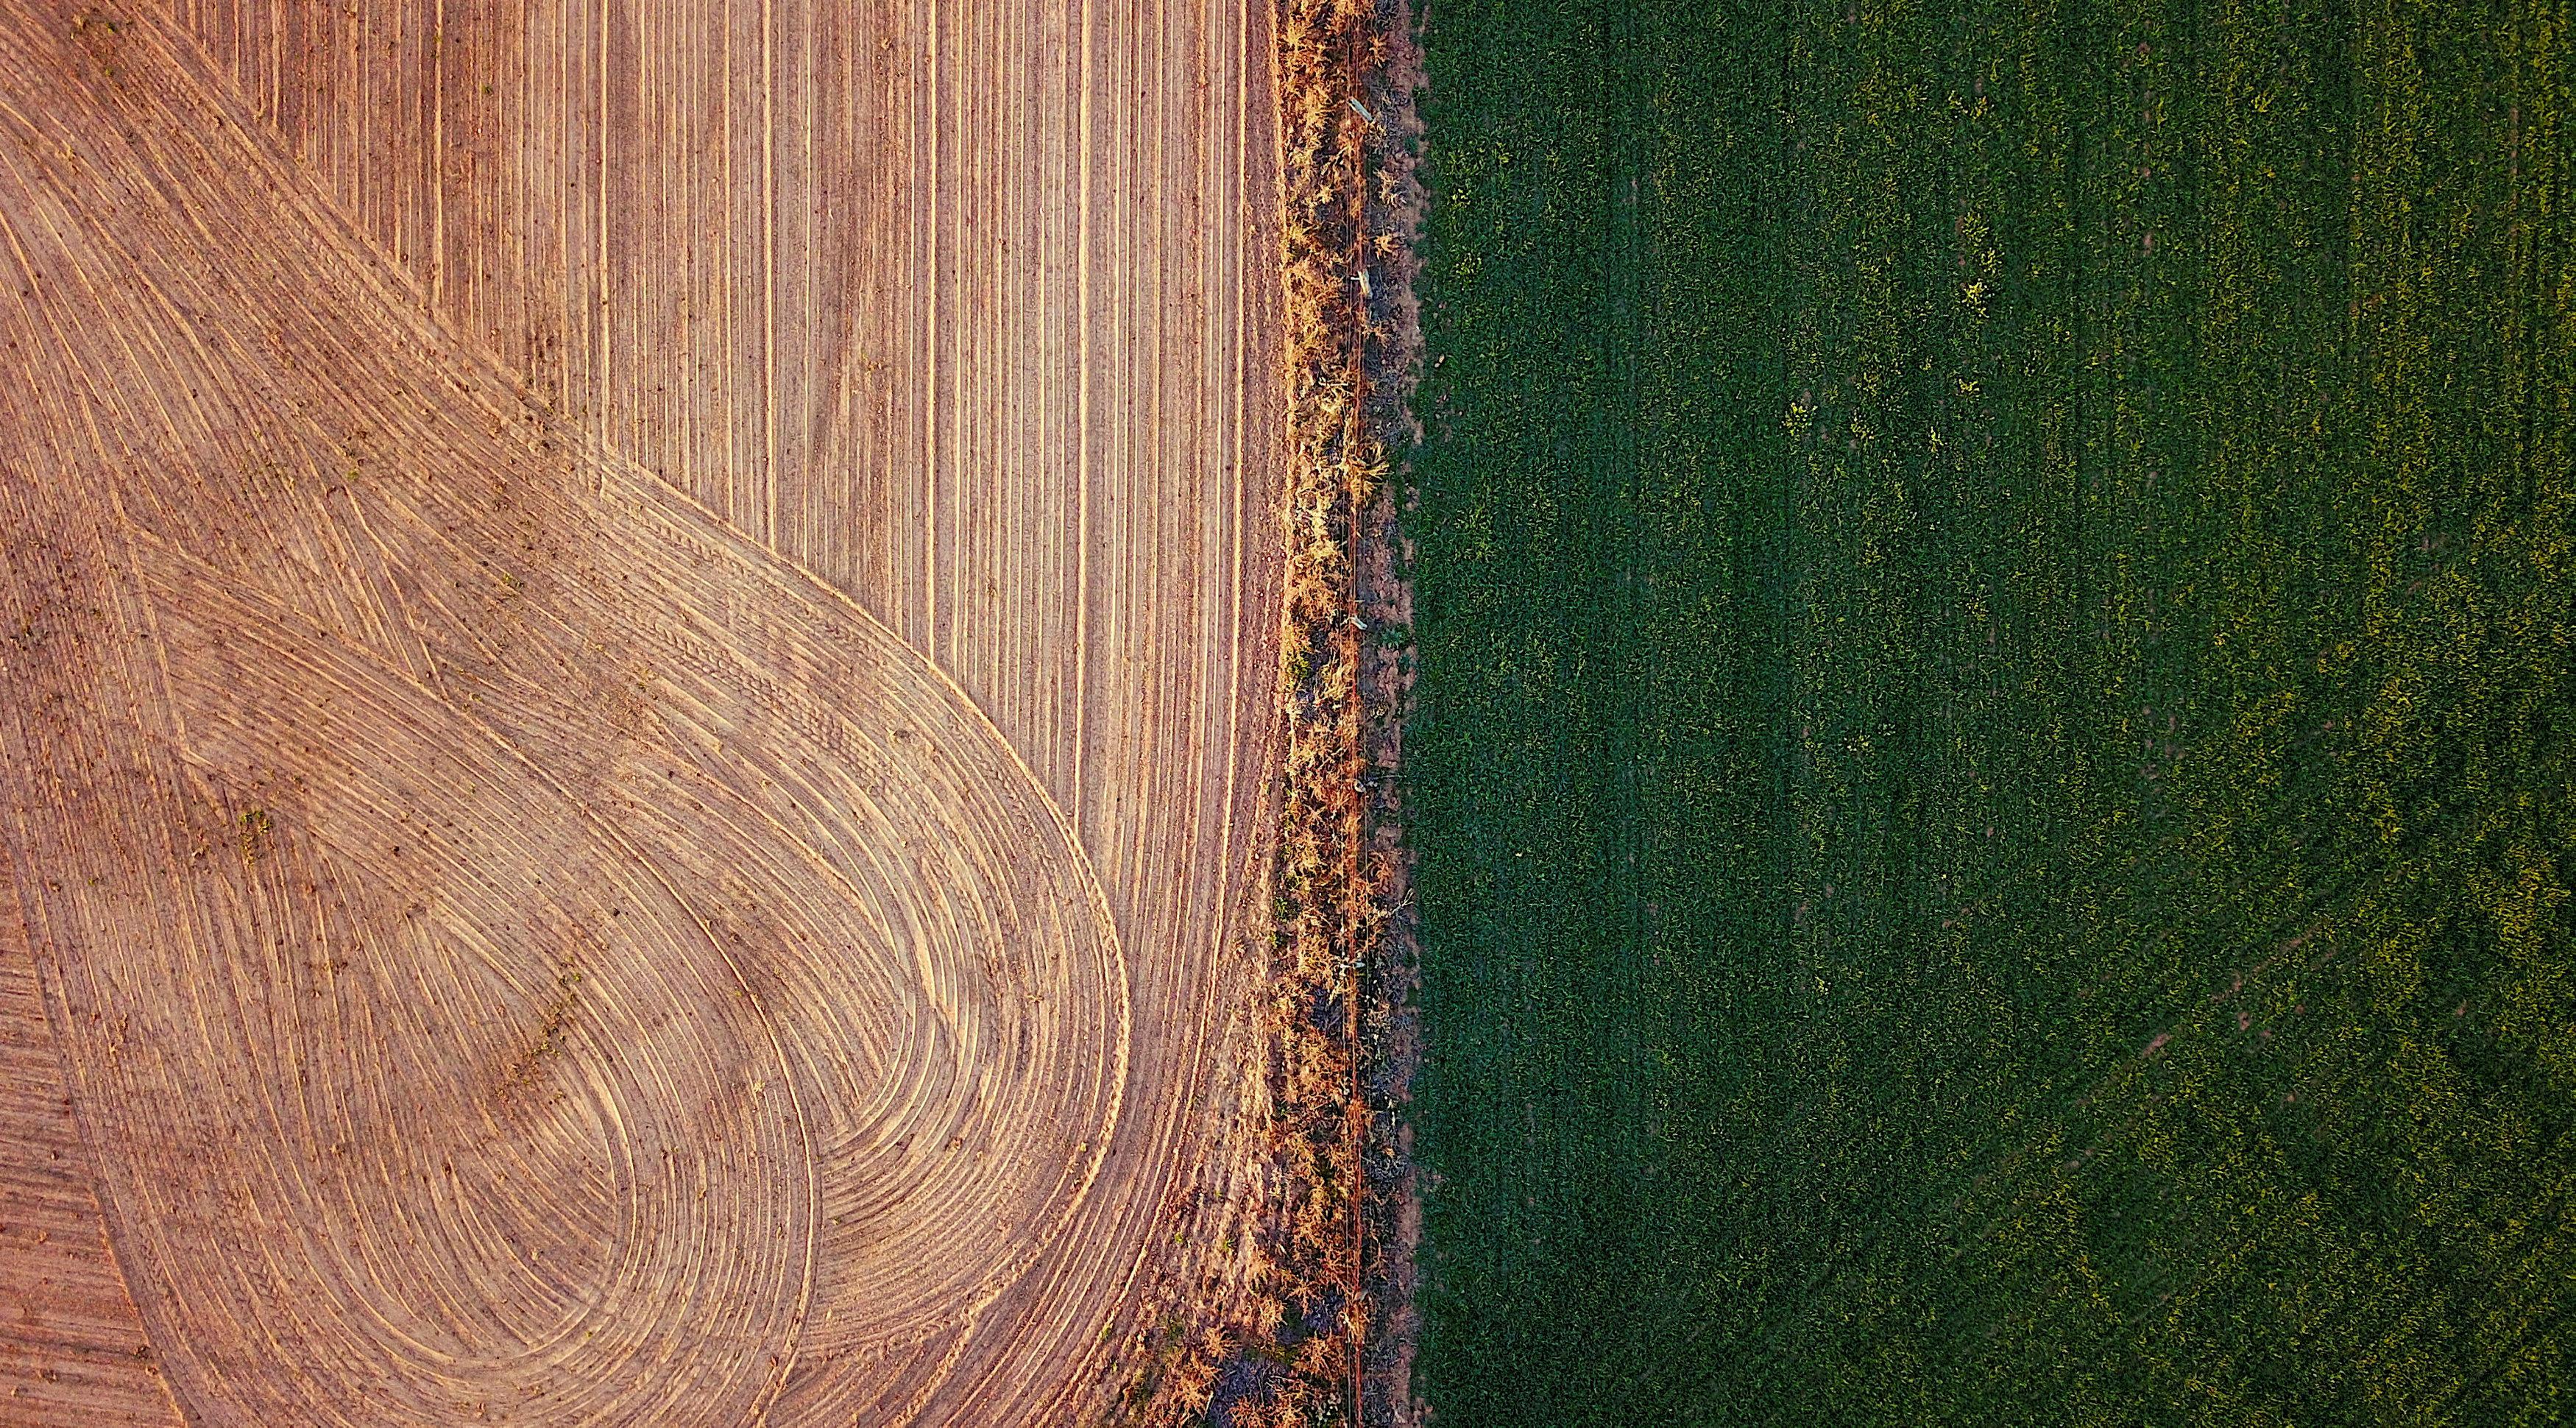 essay on farming in my town